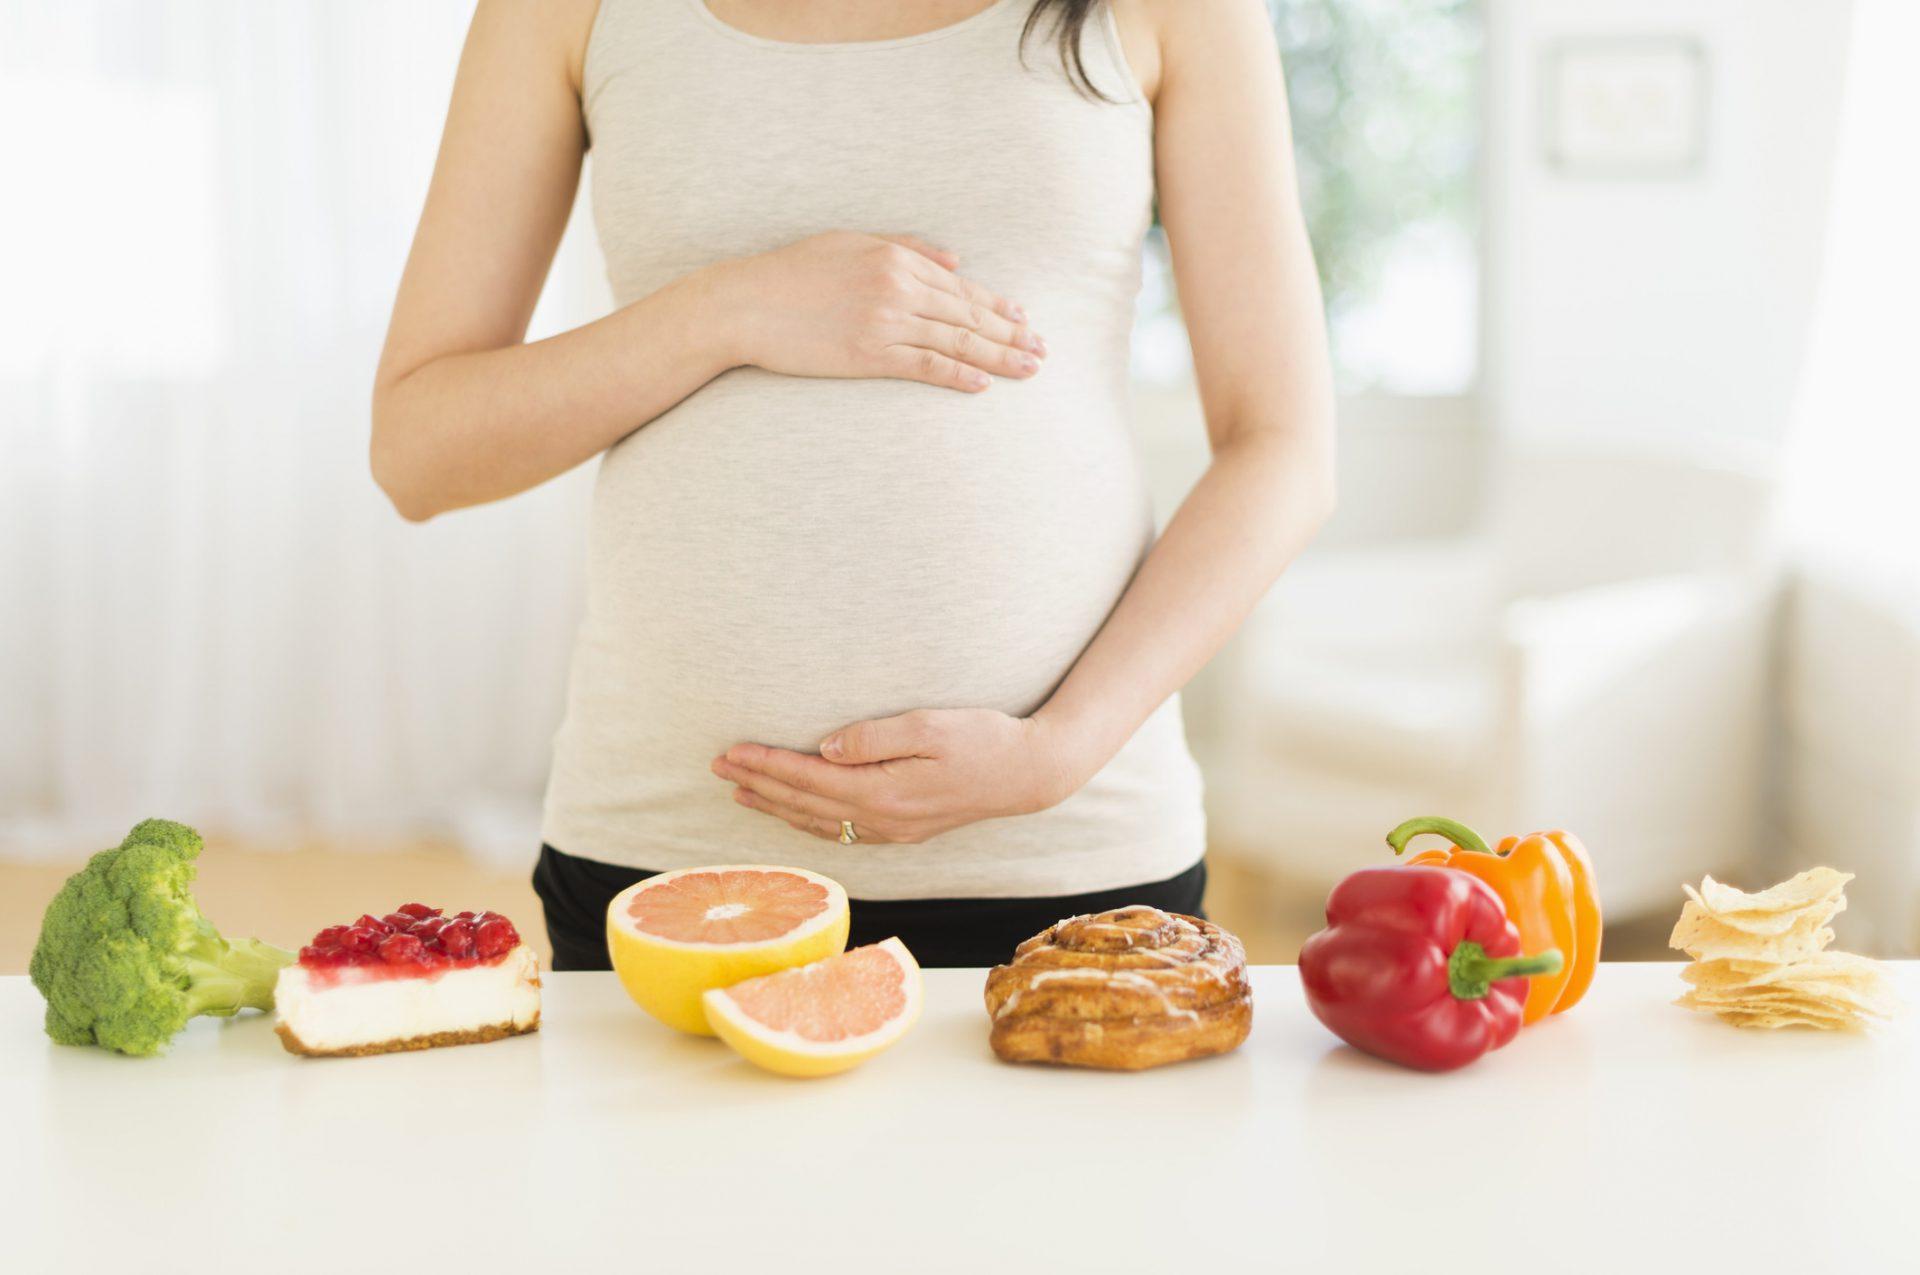 Особенности питания при беременности Питание беременных